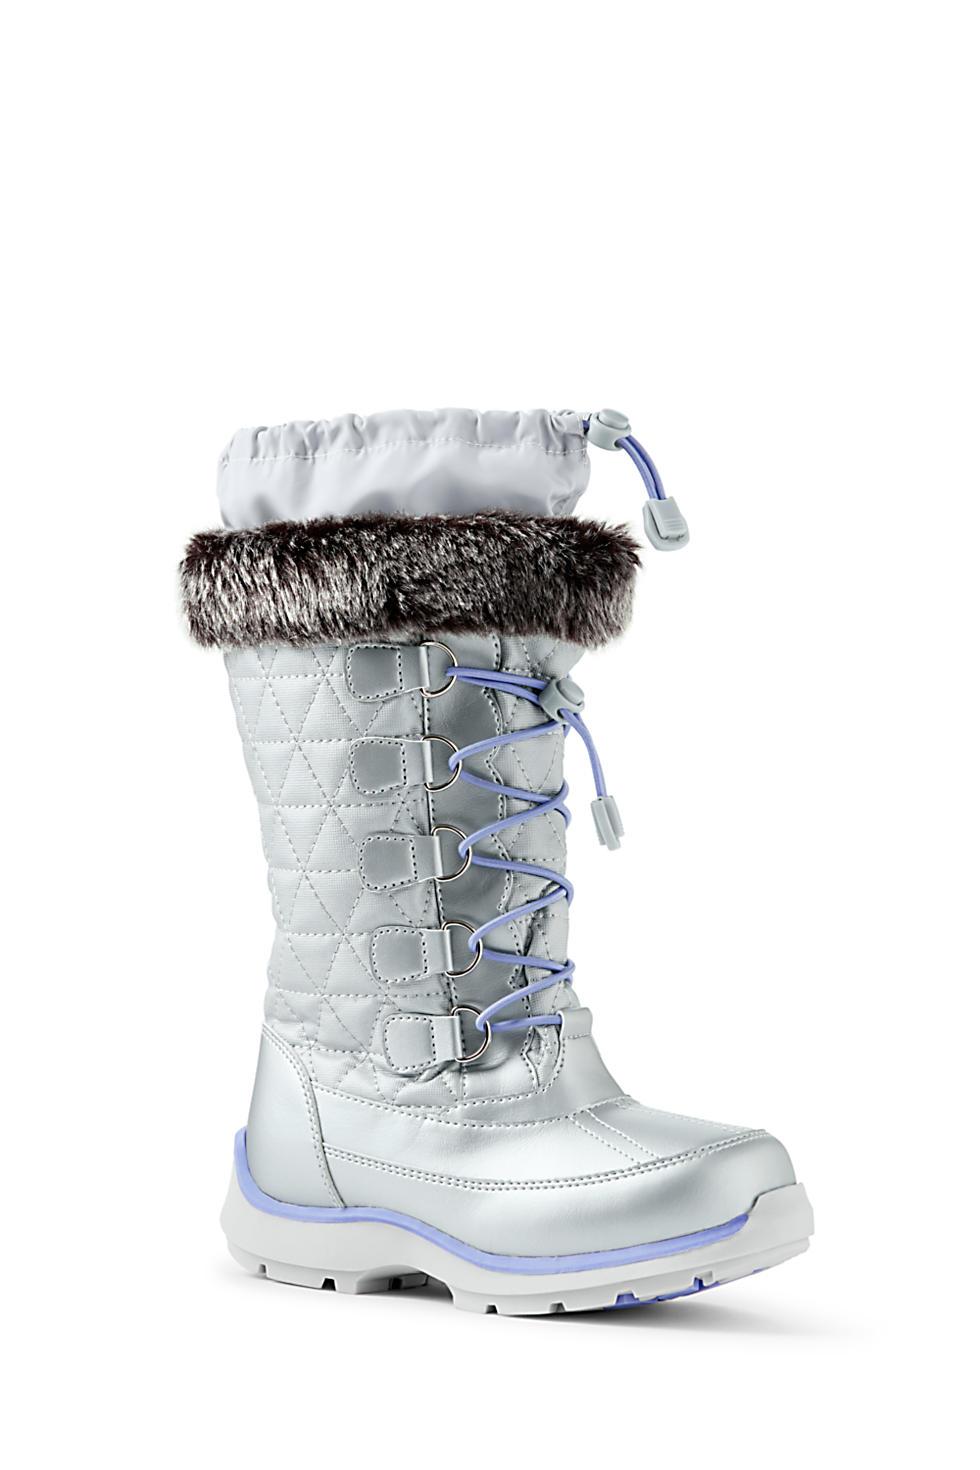 Girls Snowflake Winter Snow Boots (sizes 5, 6 & 7)